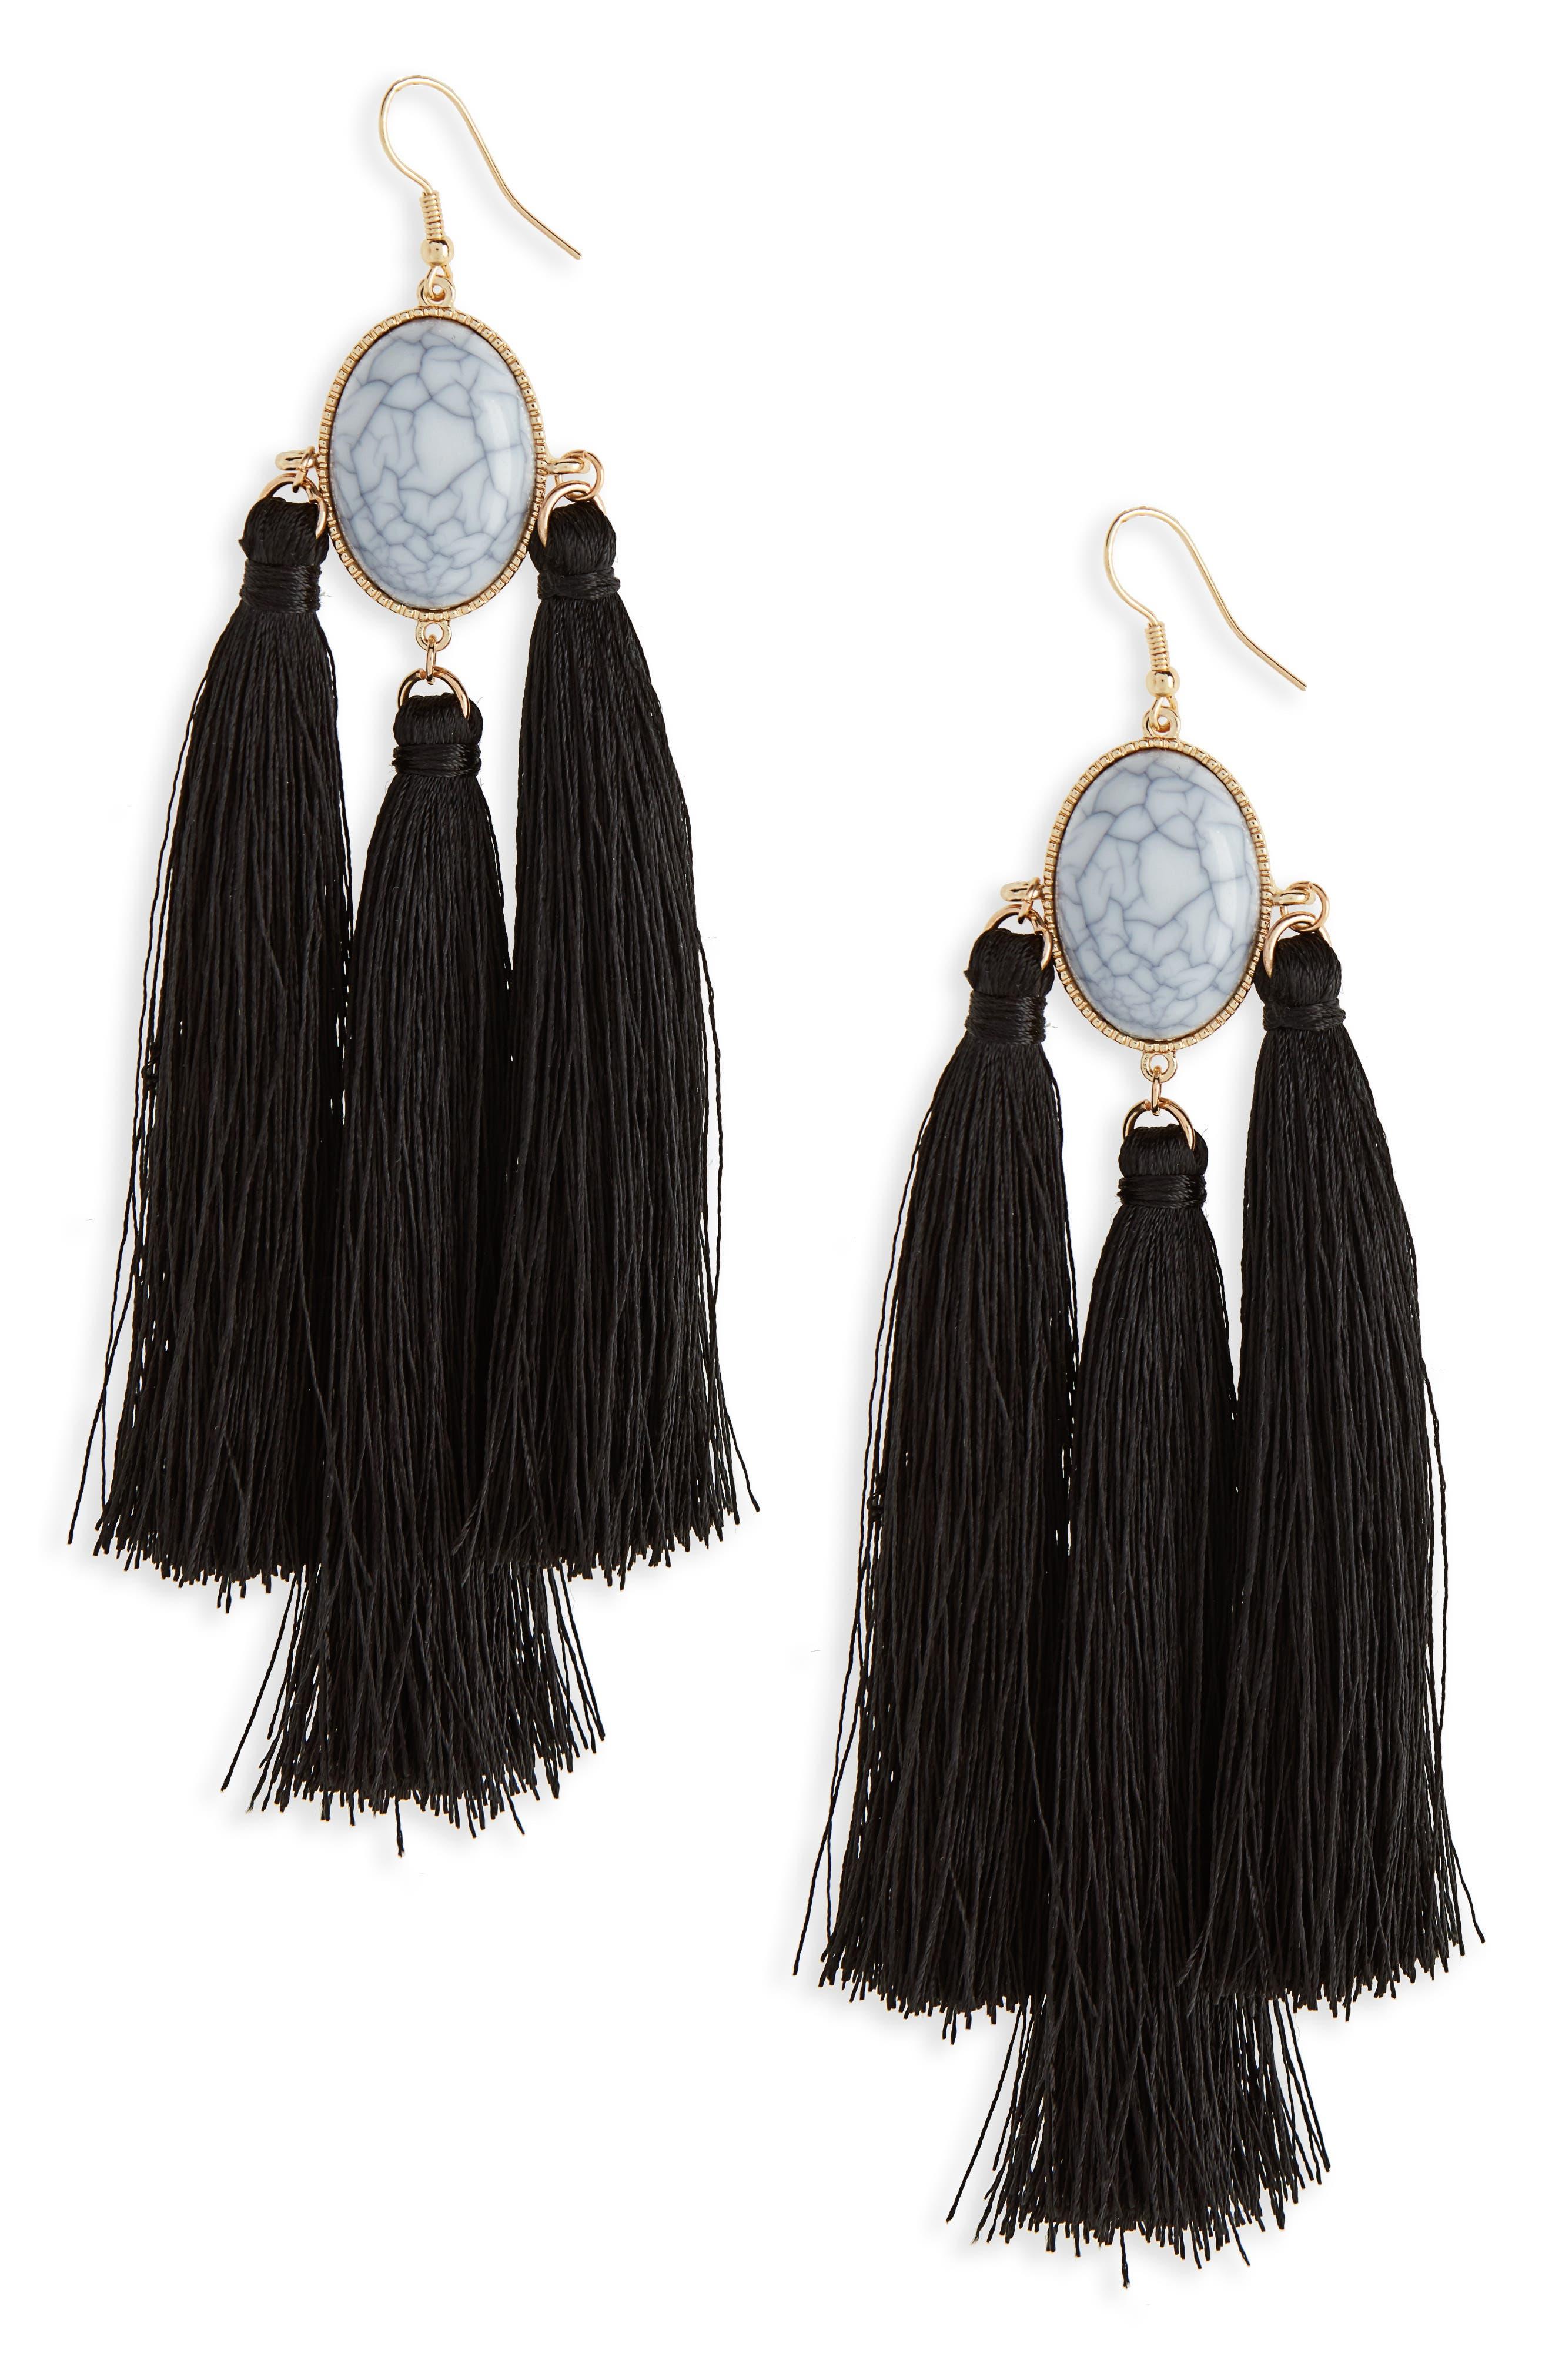 Marbled Bead & Tassel Earrings,                             Main thumbnail 1, color,                             Marble/ Black